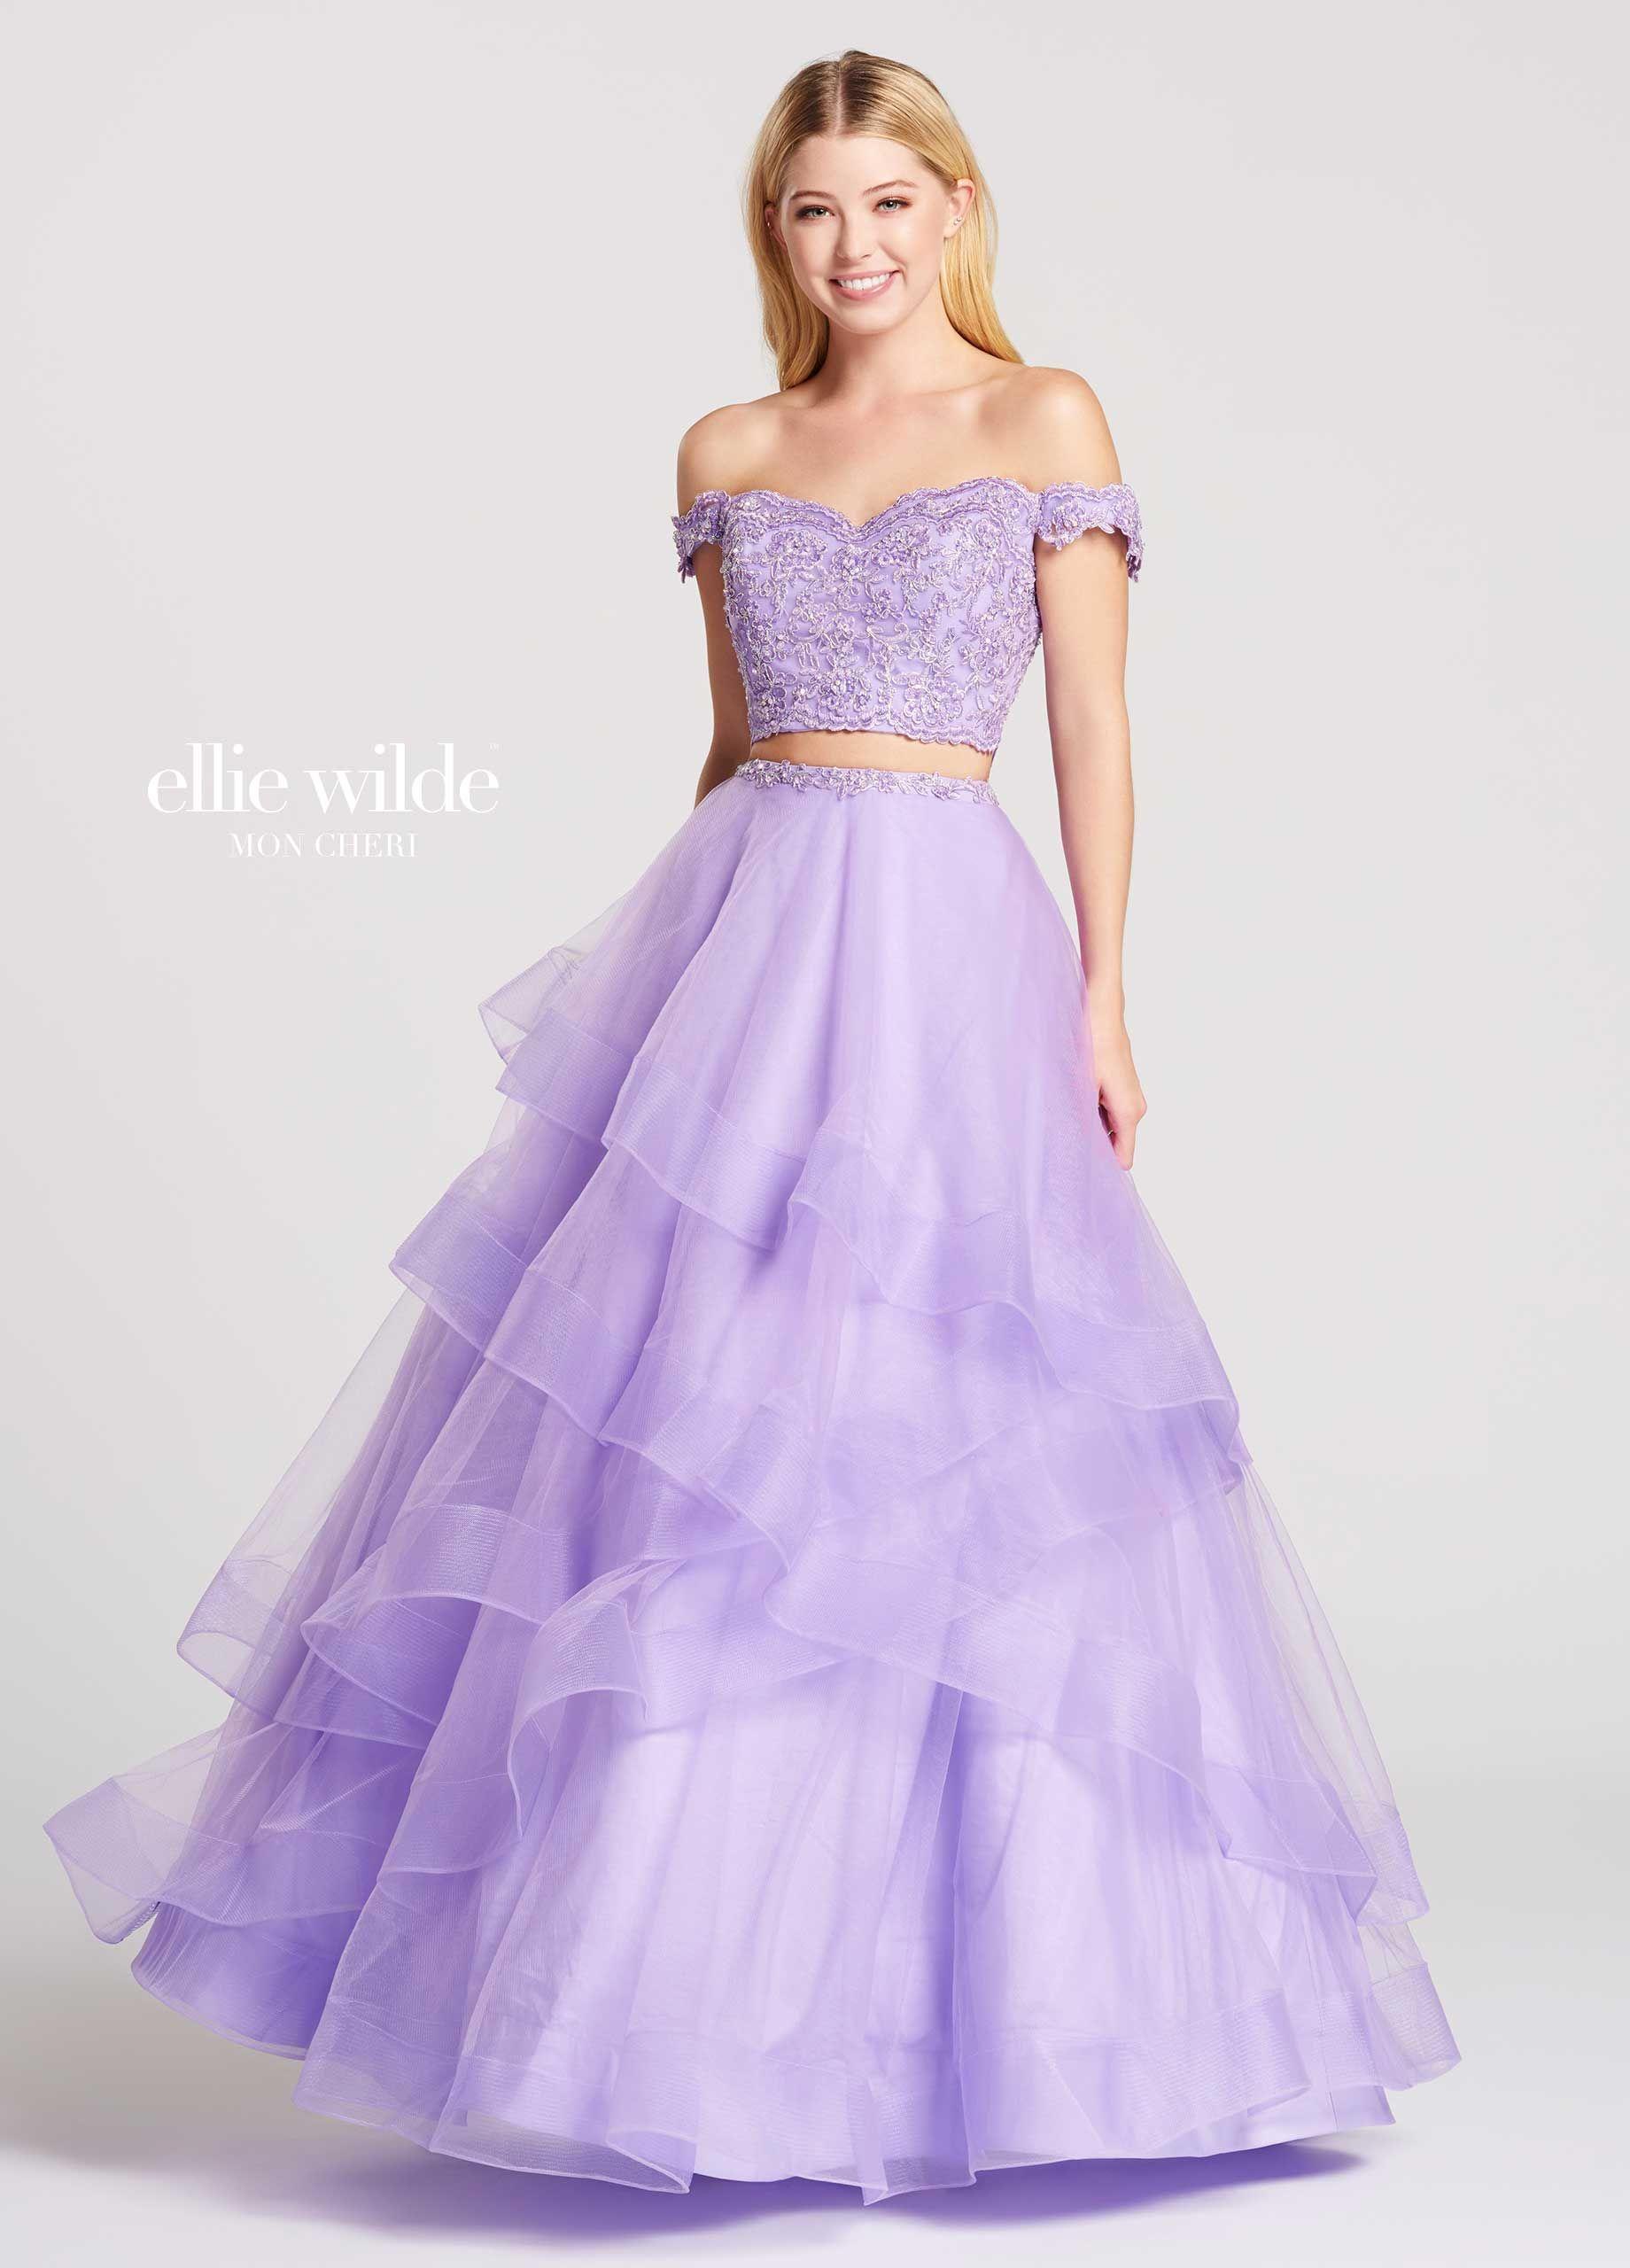 Twopiece offtheshoulder tulle u lace aline prom dress ew